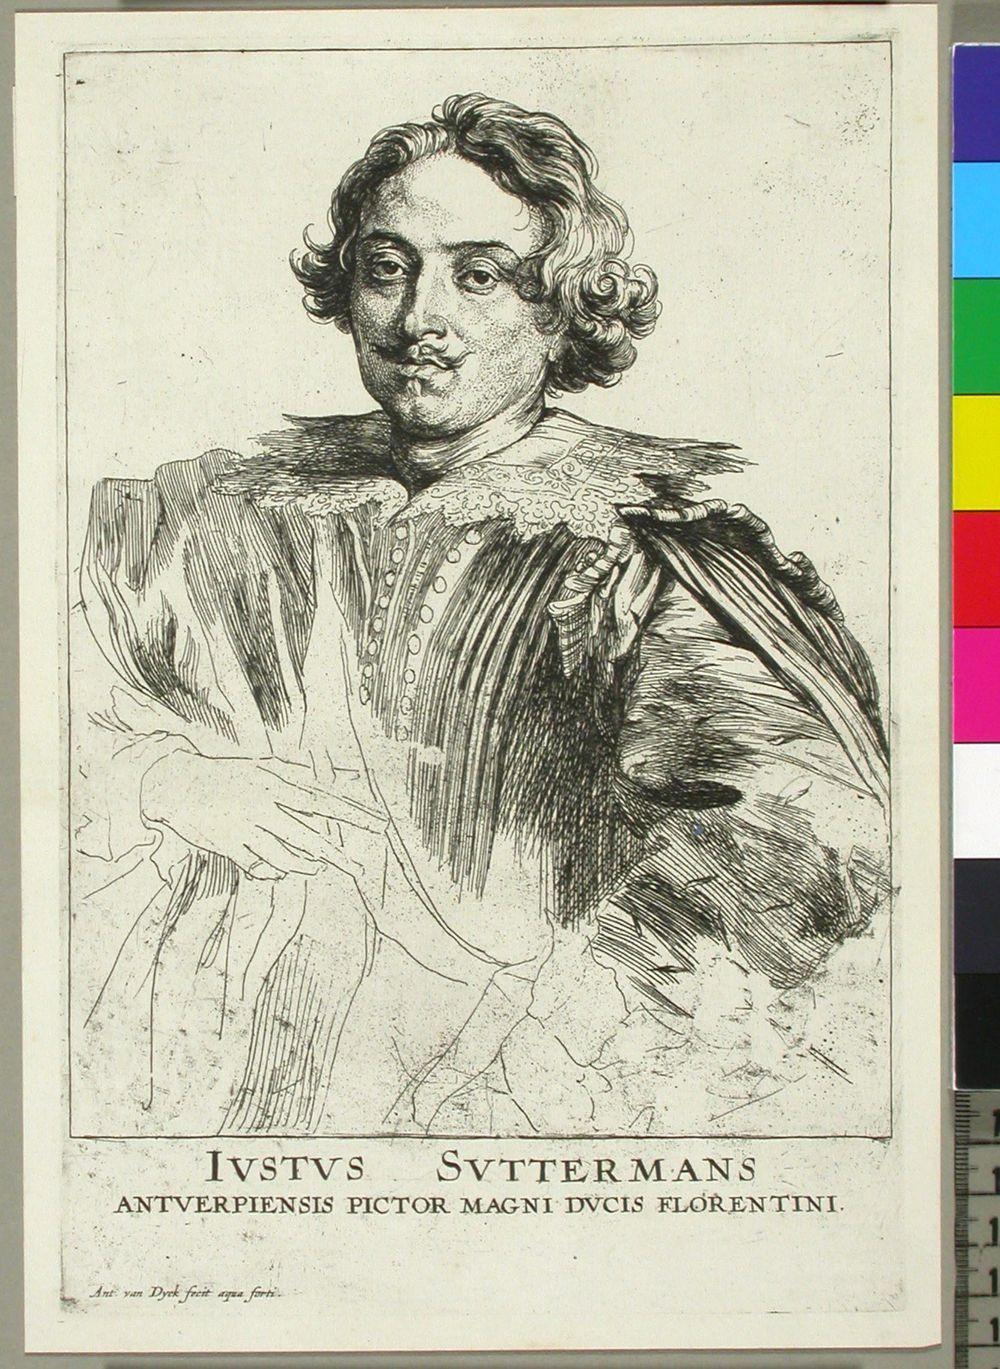 Justus Suttermans